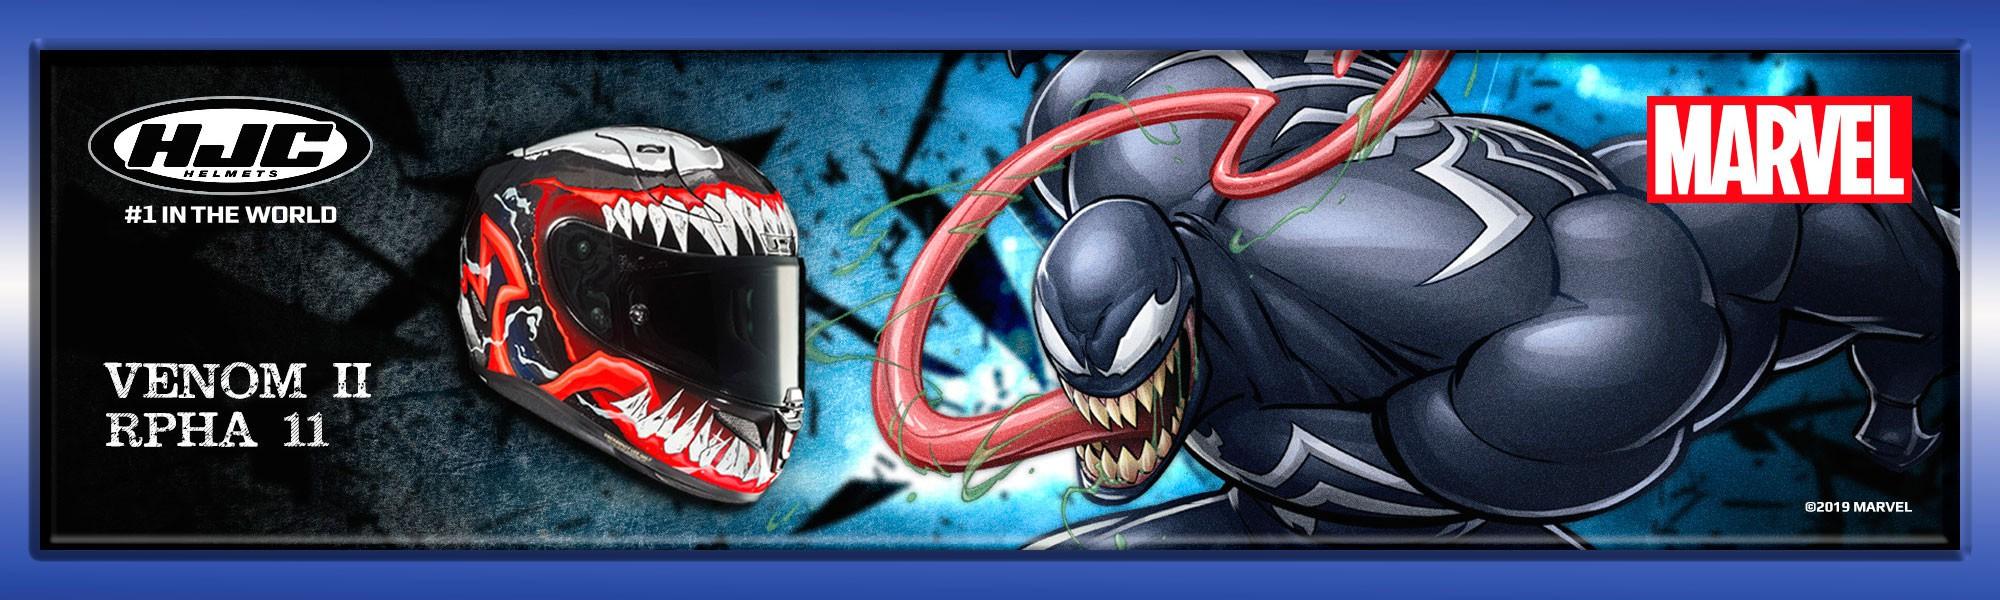 HJC Venom II